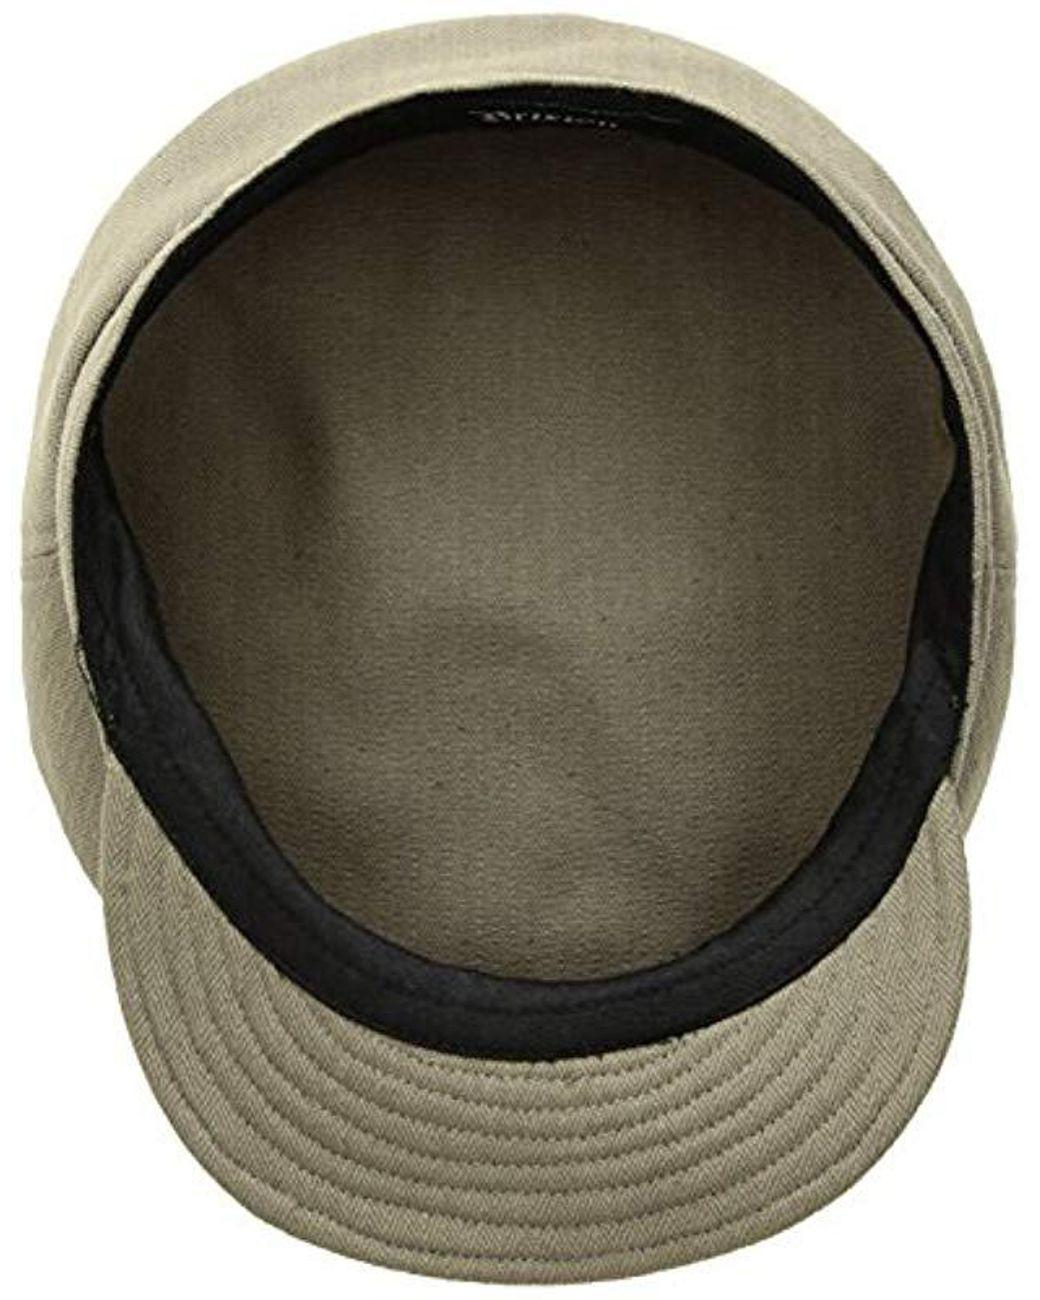 8cf873b4 Brixton Fiddler Unstructured Greek Fisherman Hat in Green for Men - Save  13% - Lyst